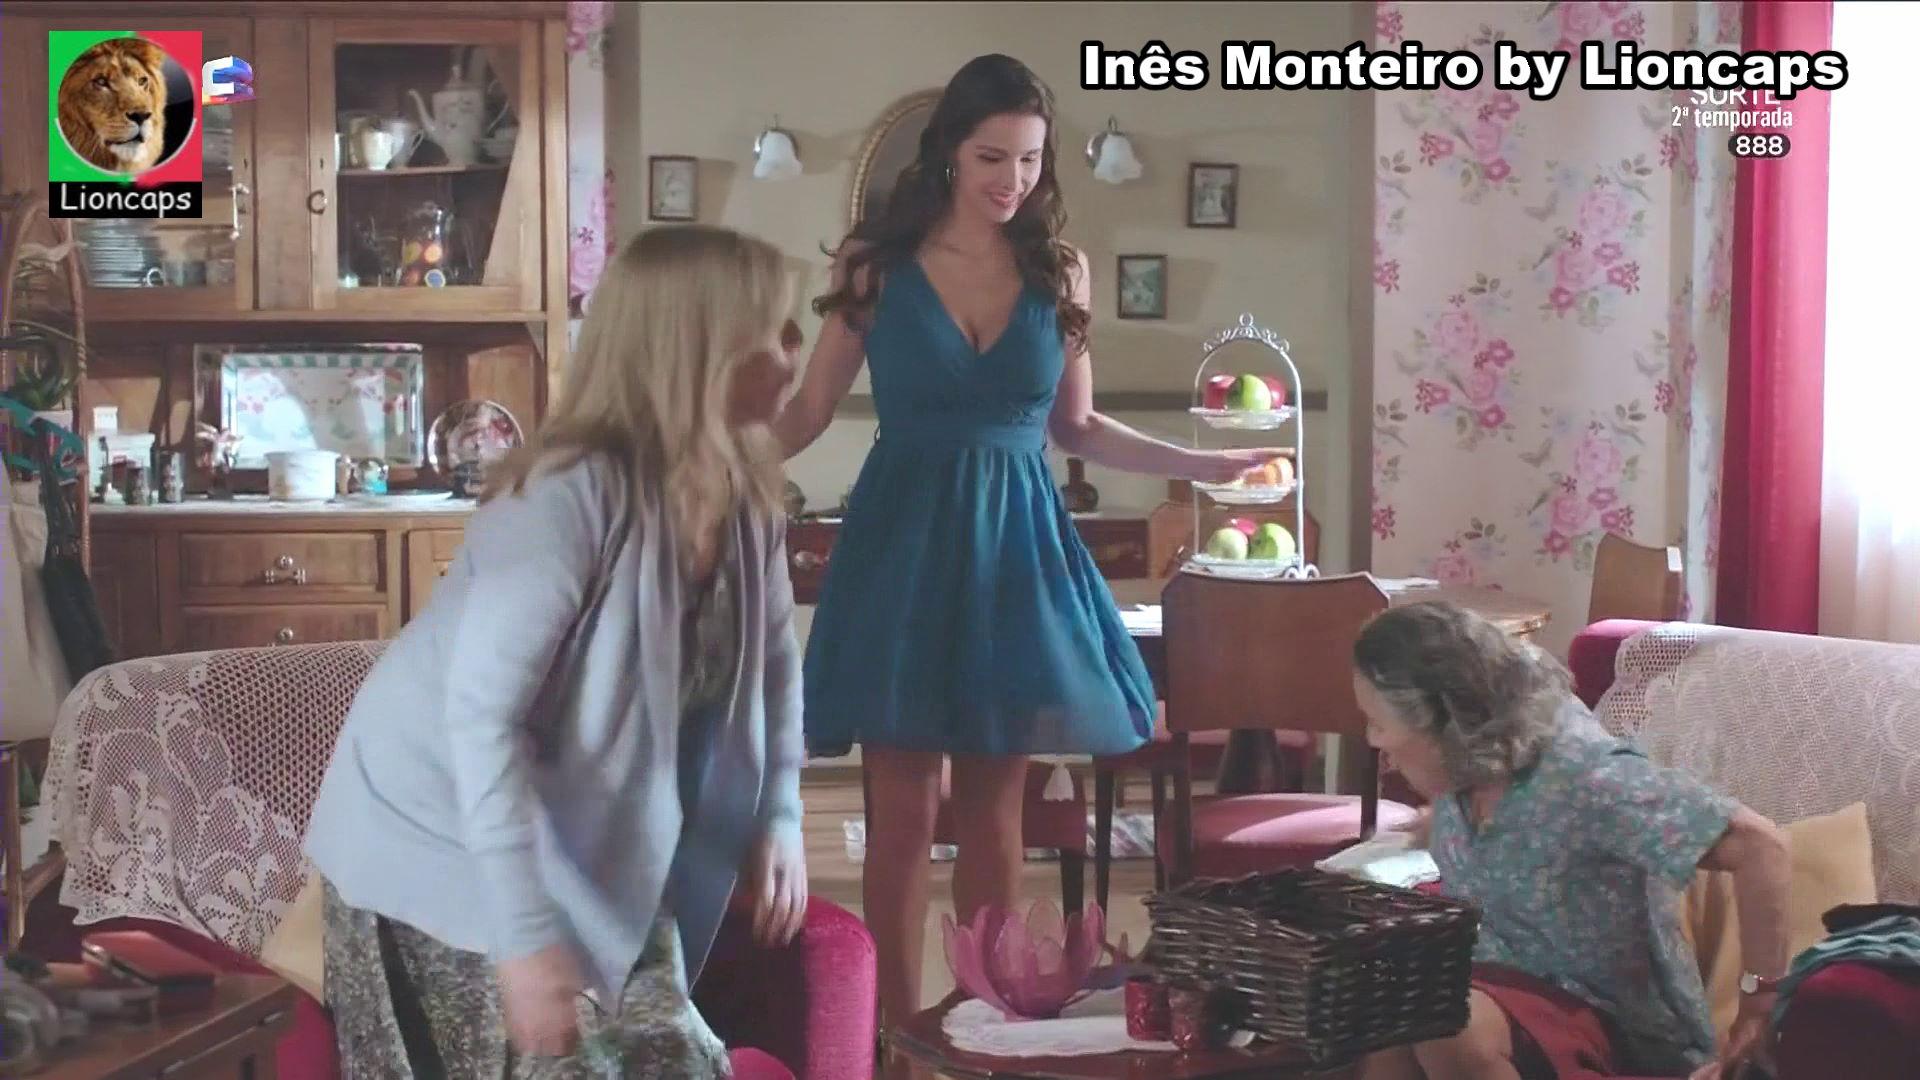 268159248_ines_monteiro_vs190831_1181_122_490lo.JPG